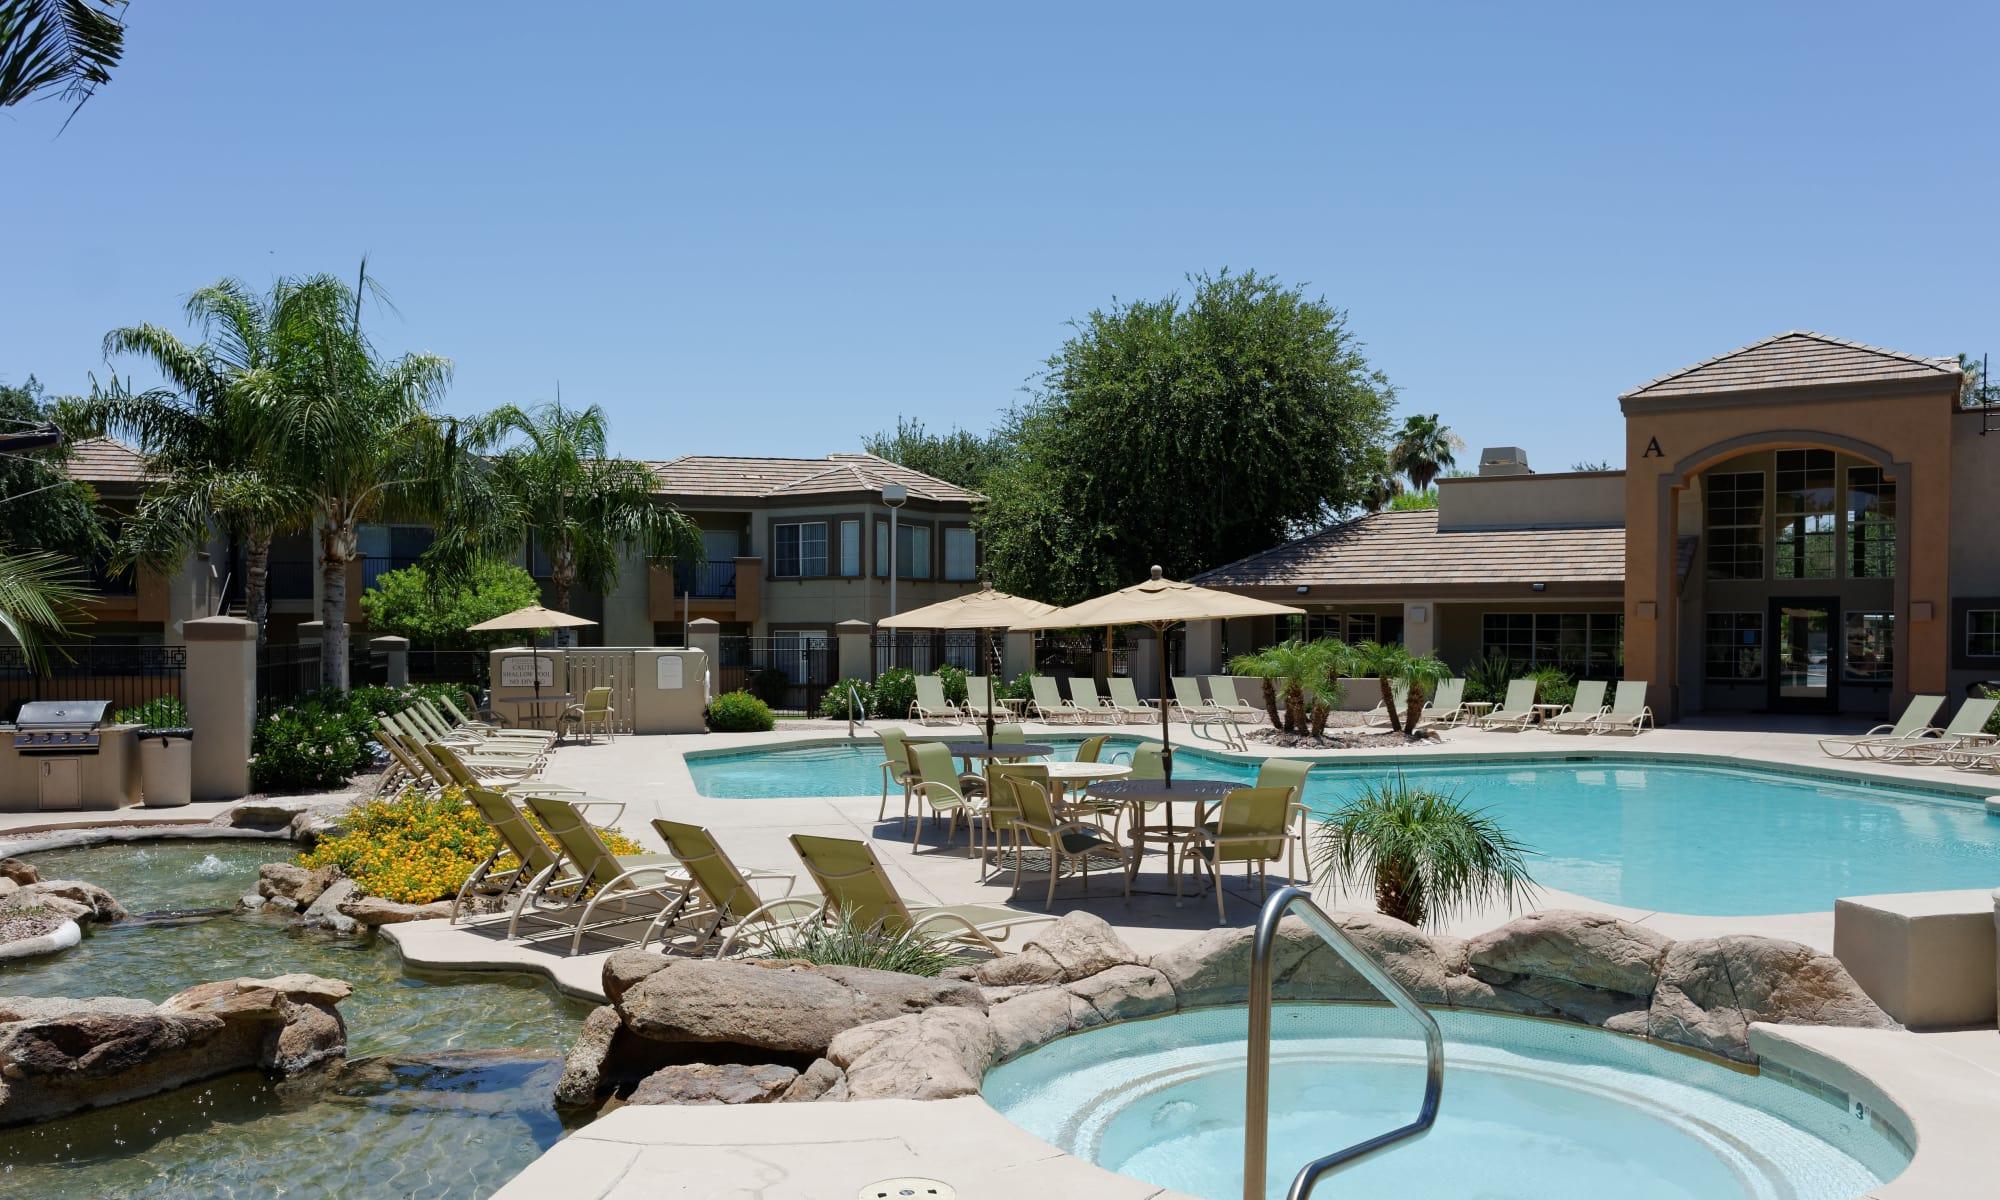 southwest tempe az apartments in maricopa county finisterra